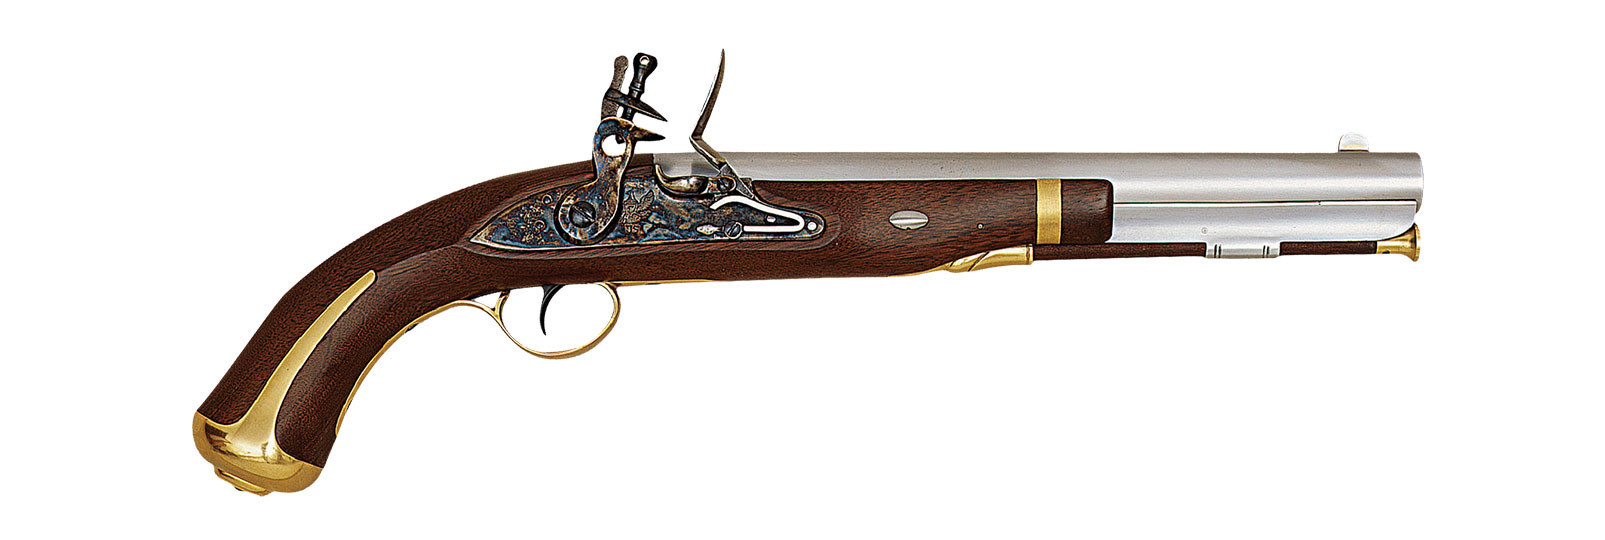 Pistola Harper's Ferry